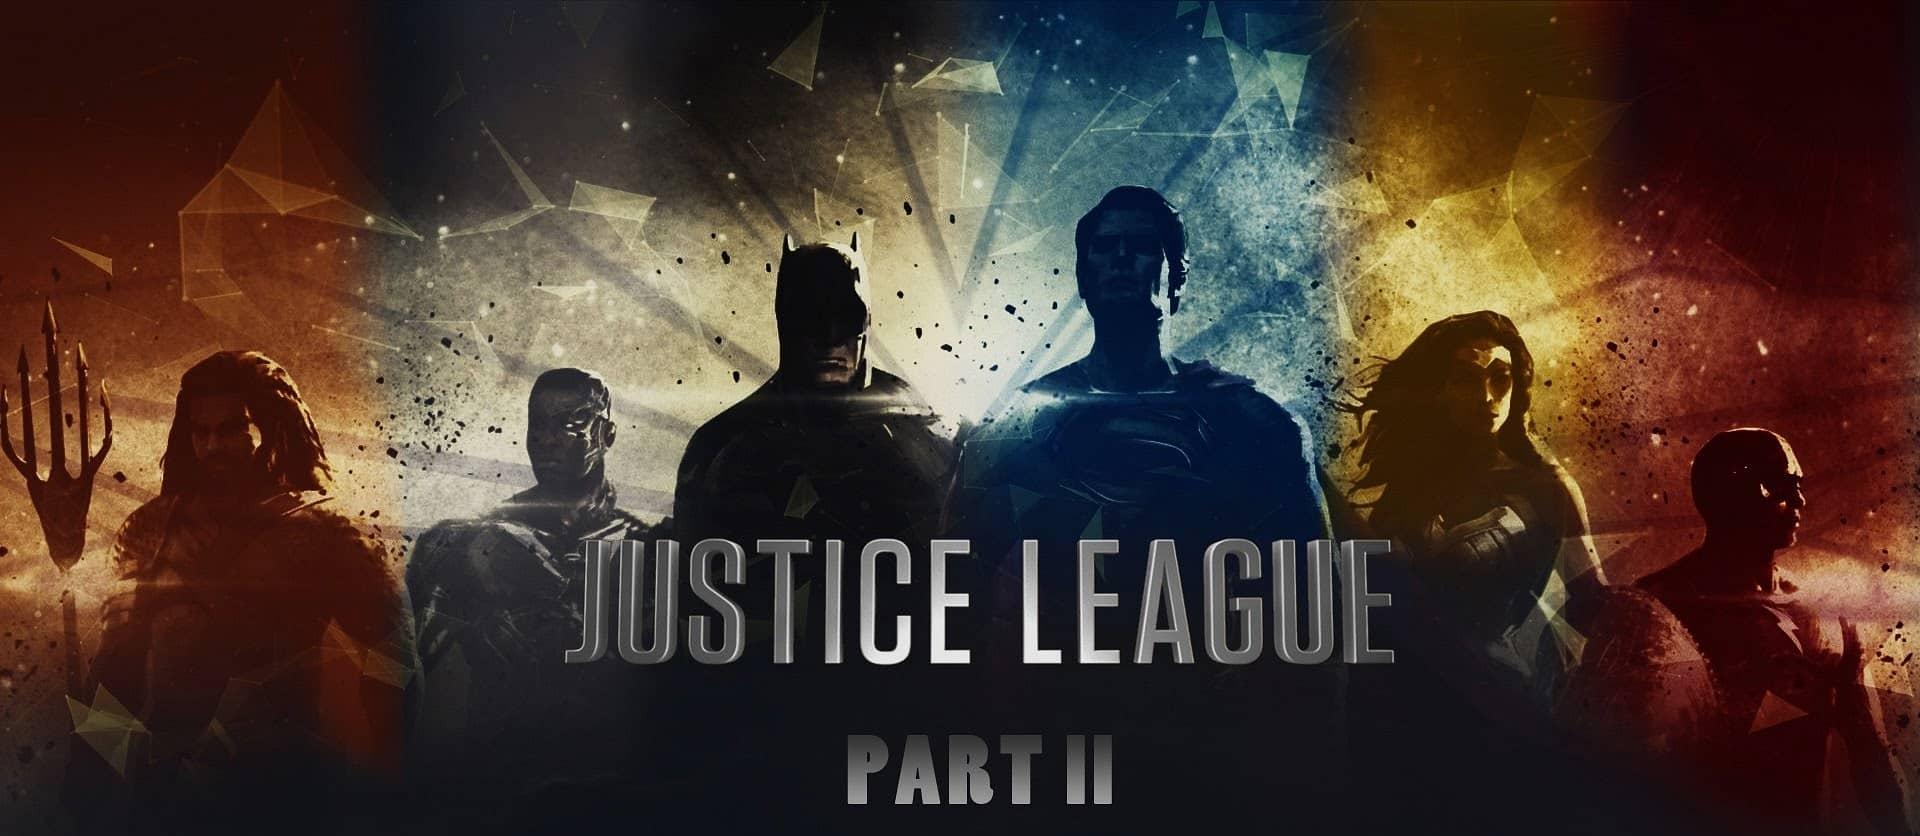 Süper Kahraman Filmi justice league part 2